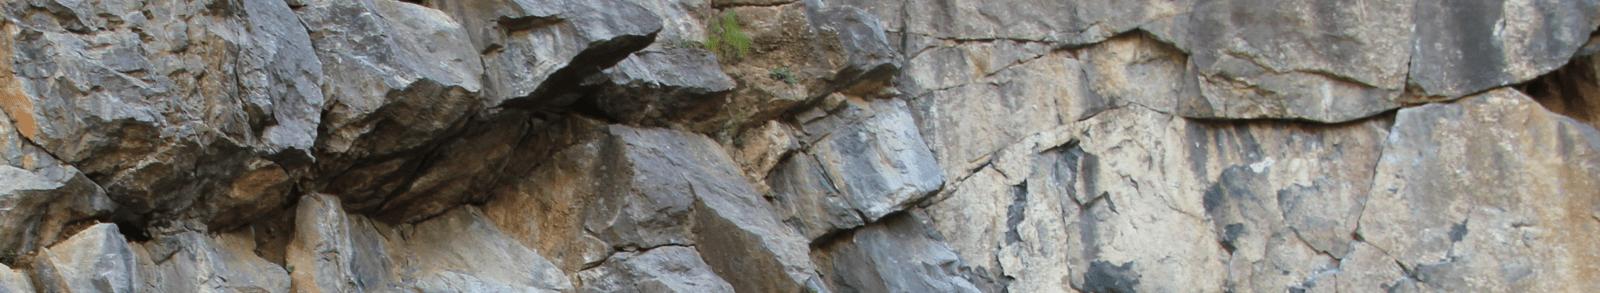 Platzhalter Klettergebiet Oberhagen header